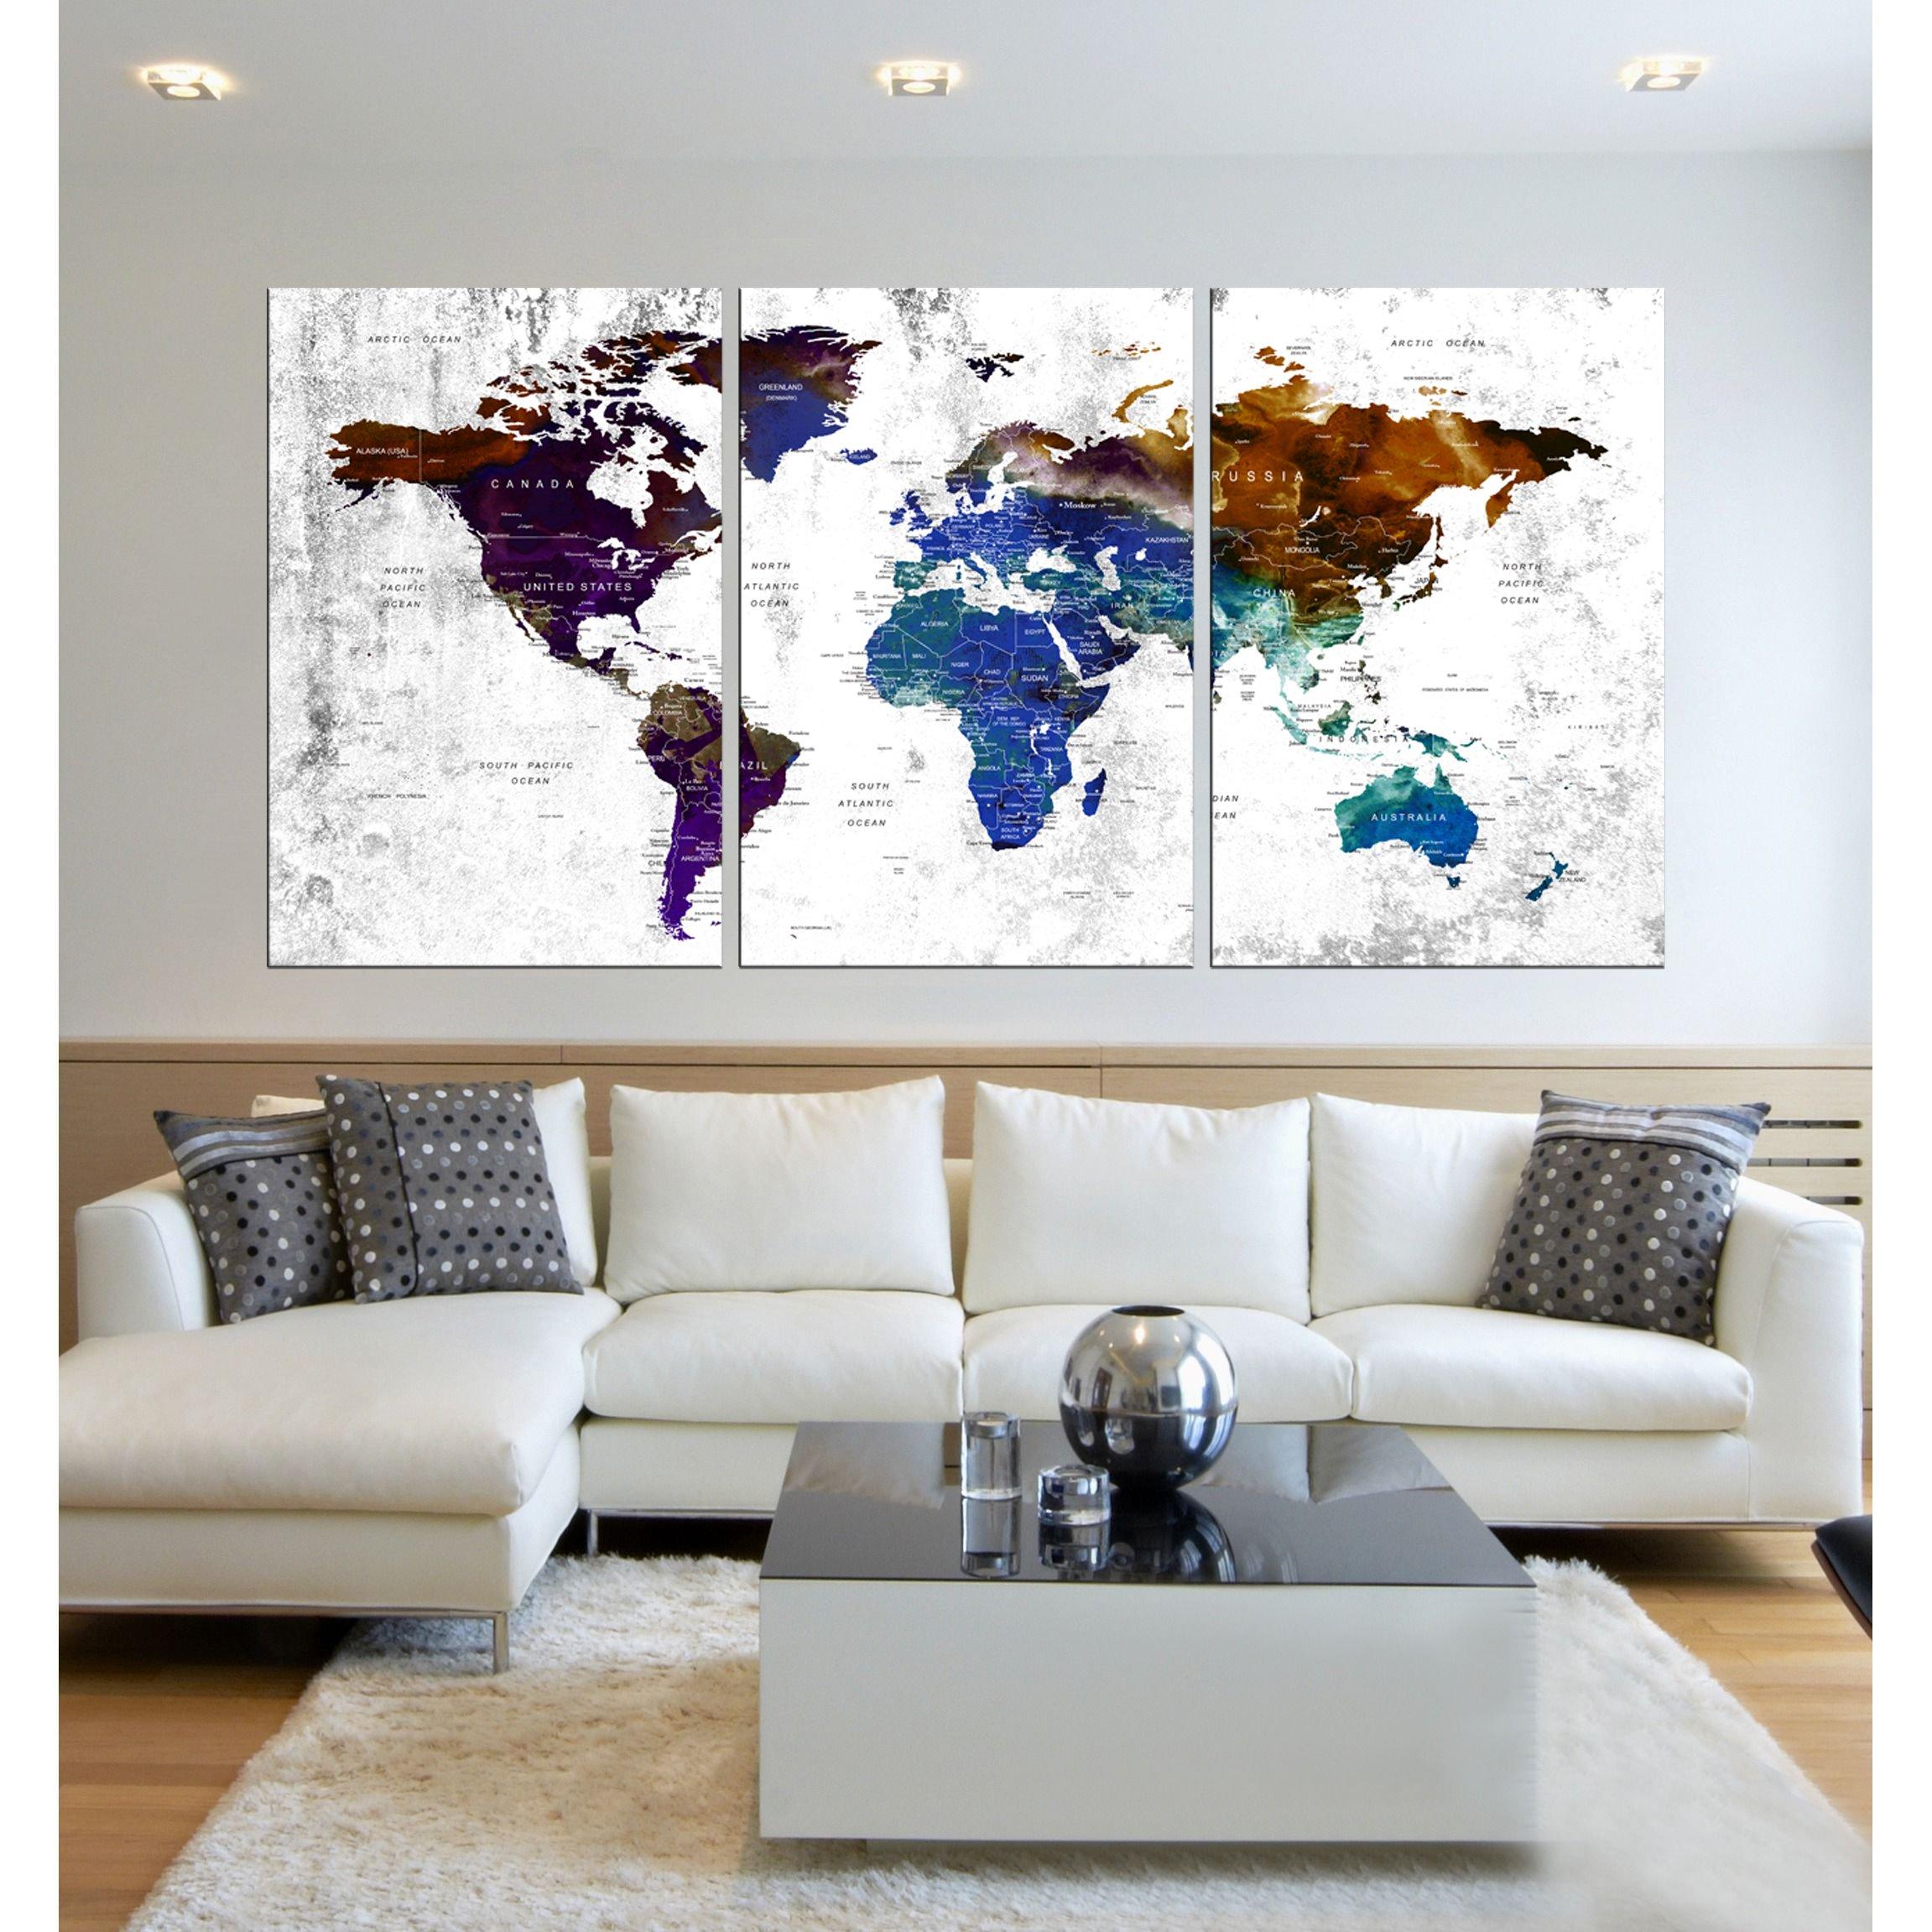 Visual Art Decor Large Watercolor push pin World Map Wall Art Canvas Prints Creative Map Painting Poster Prints Home Wall Decor Ready to Hang hr85